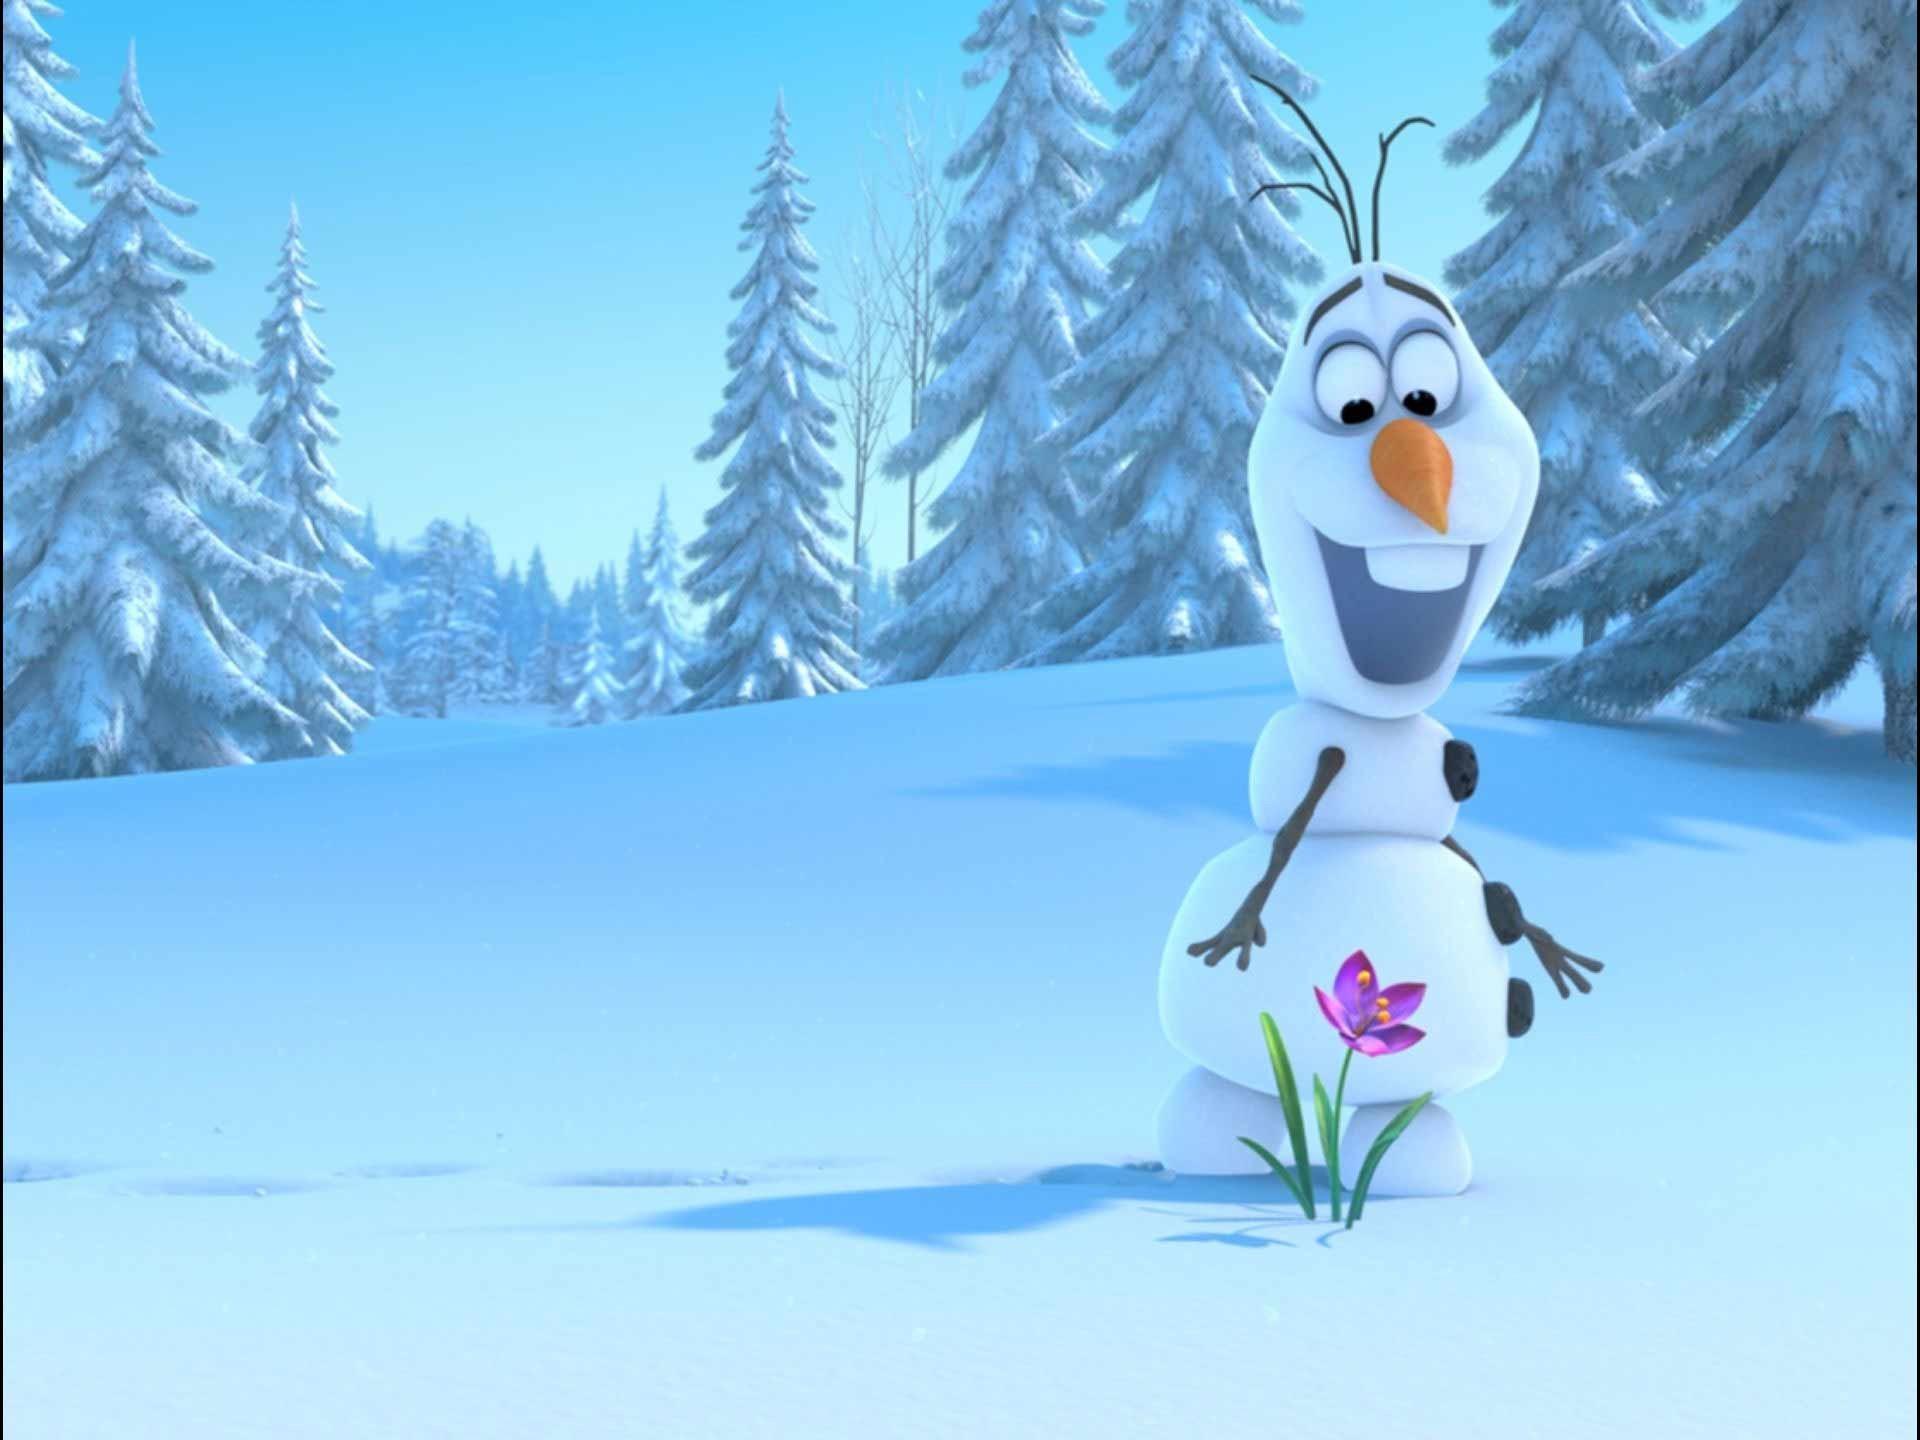 Disney Frozen Wallpapers & Desktop Backgrounds   Free HD Frozen Movie .